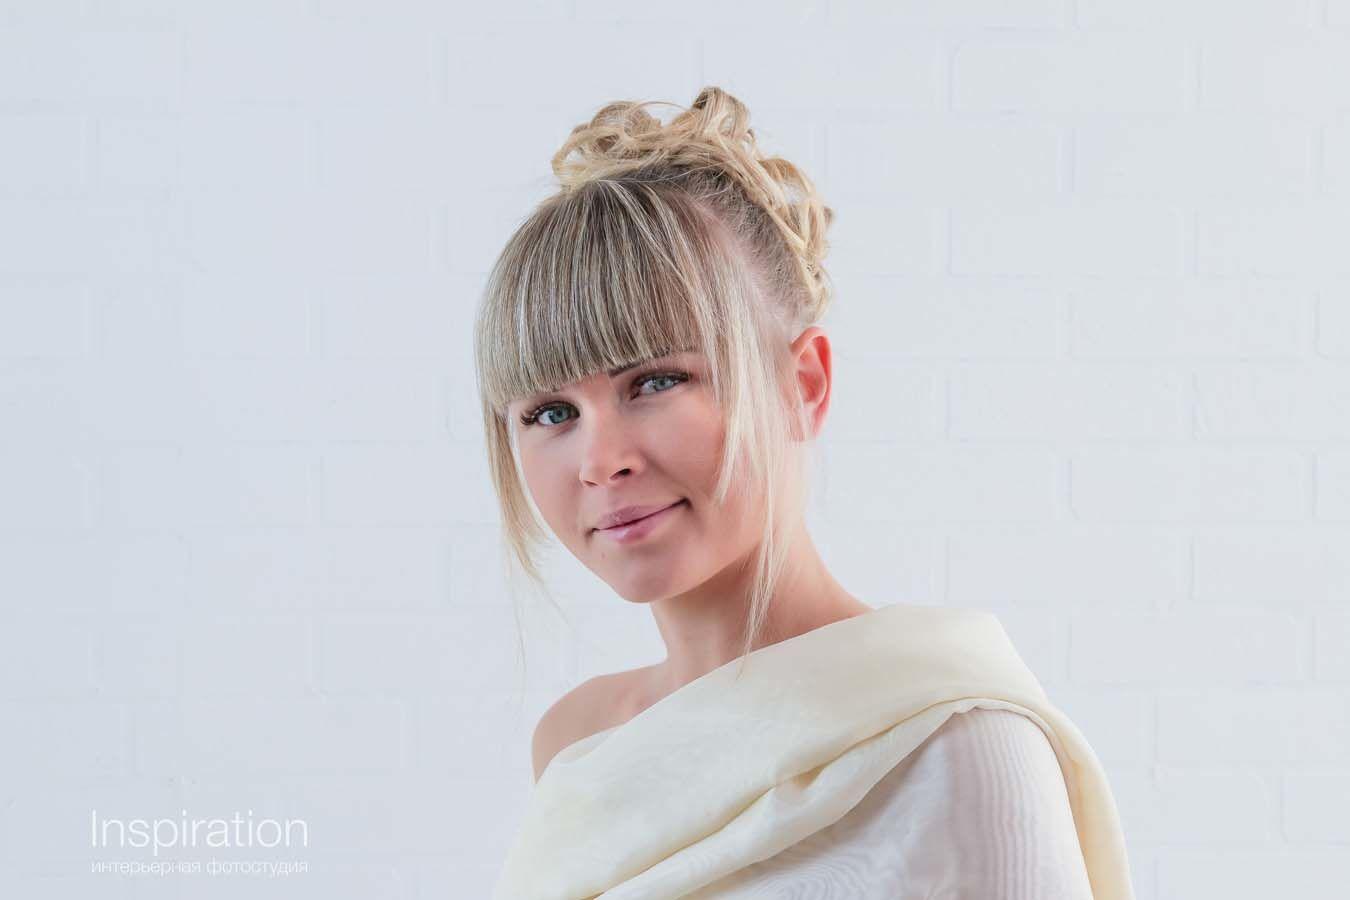 Яна Пузаткина, 25 лет